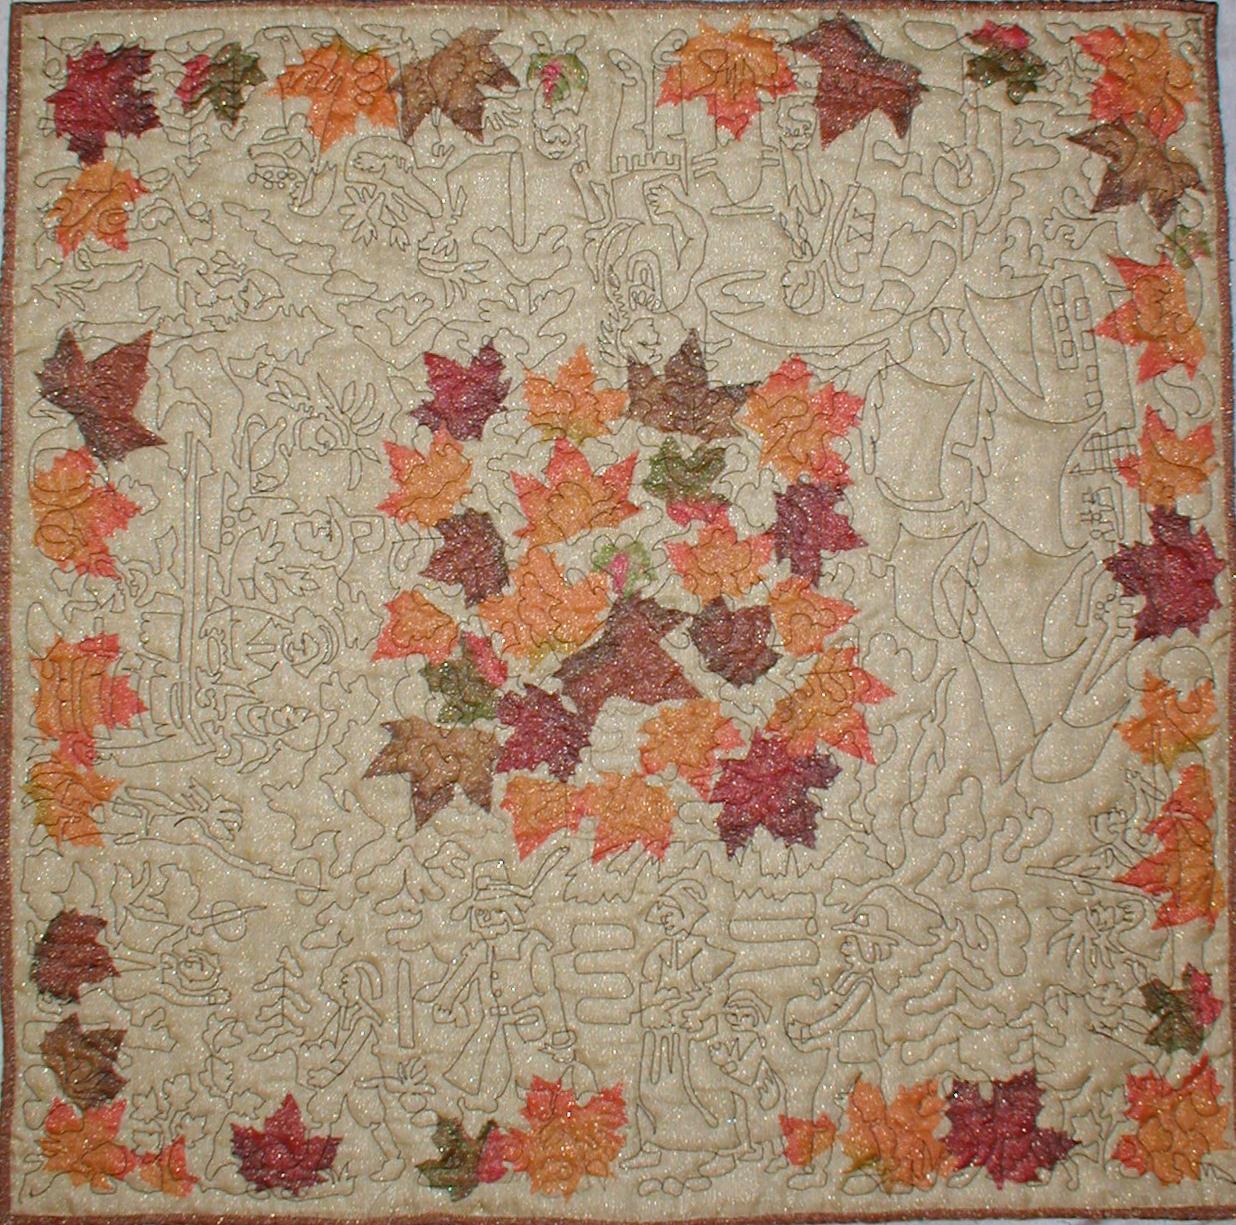 Thanksgiving Table Topper Quilt Design Meadowlyon Designs